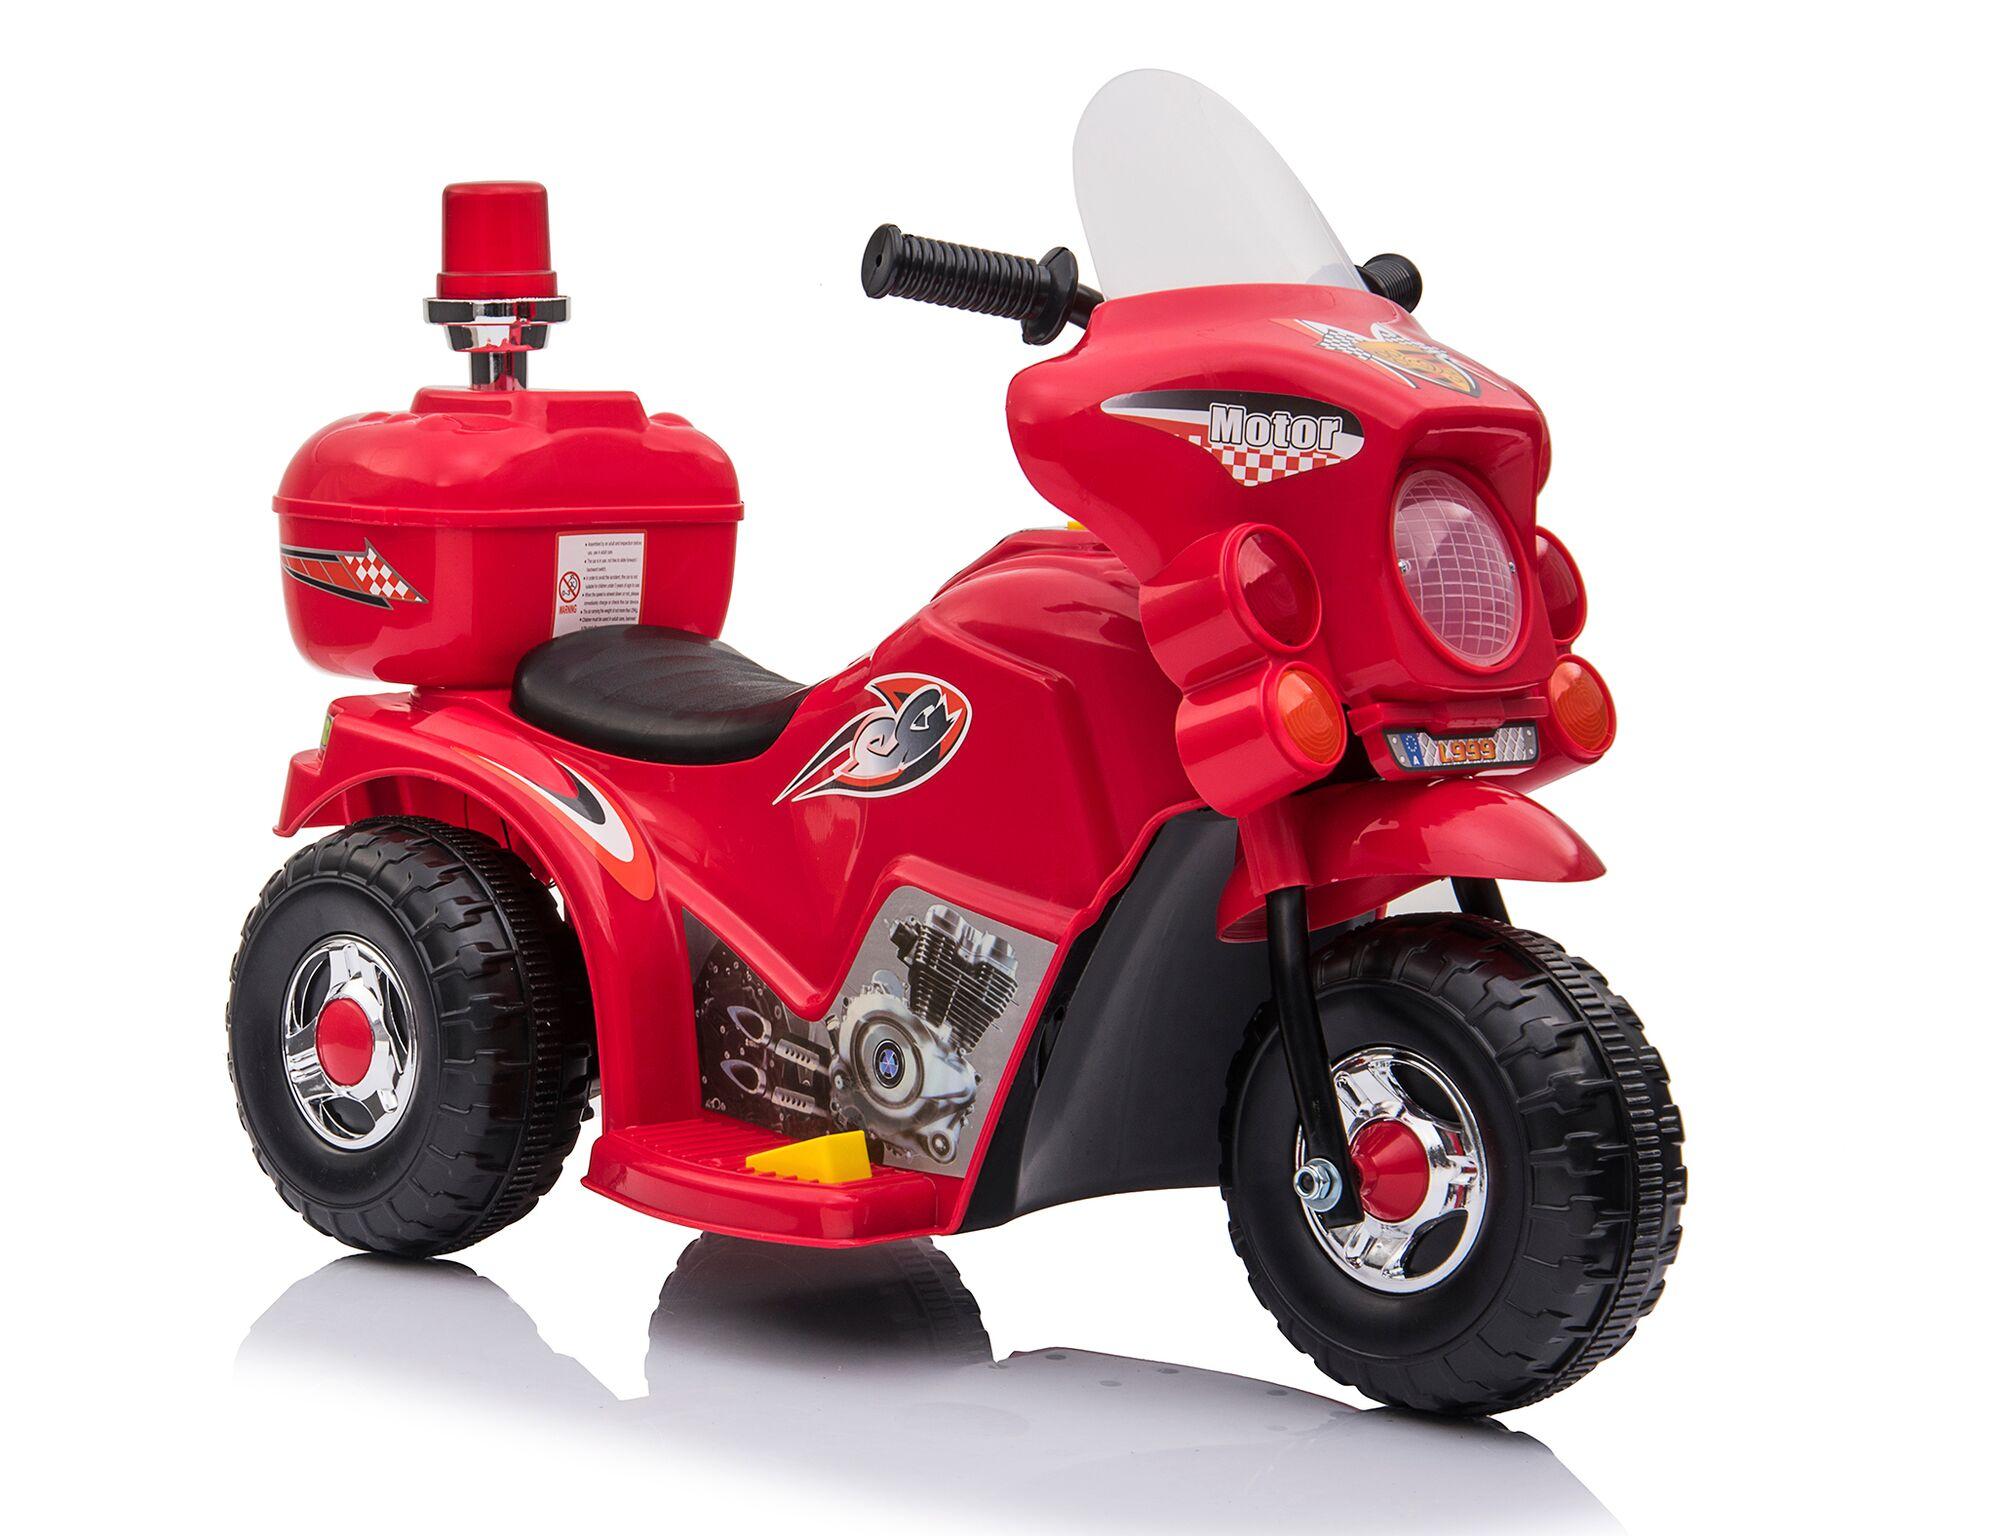 Kids-Ride-On-Motorbike-Motorcycle-Electric-Bike-Toy-Car-Trike-Battery-Red-White